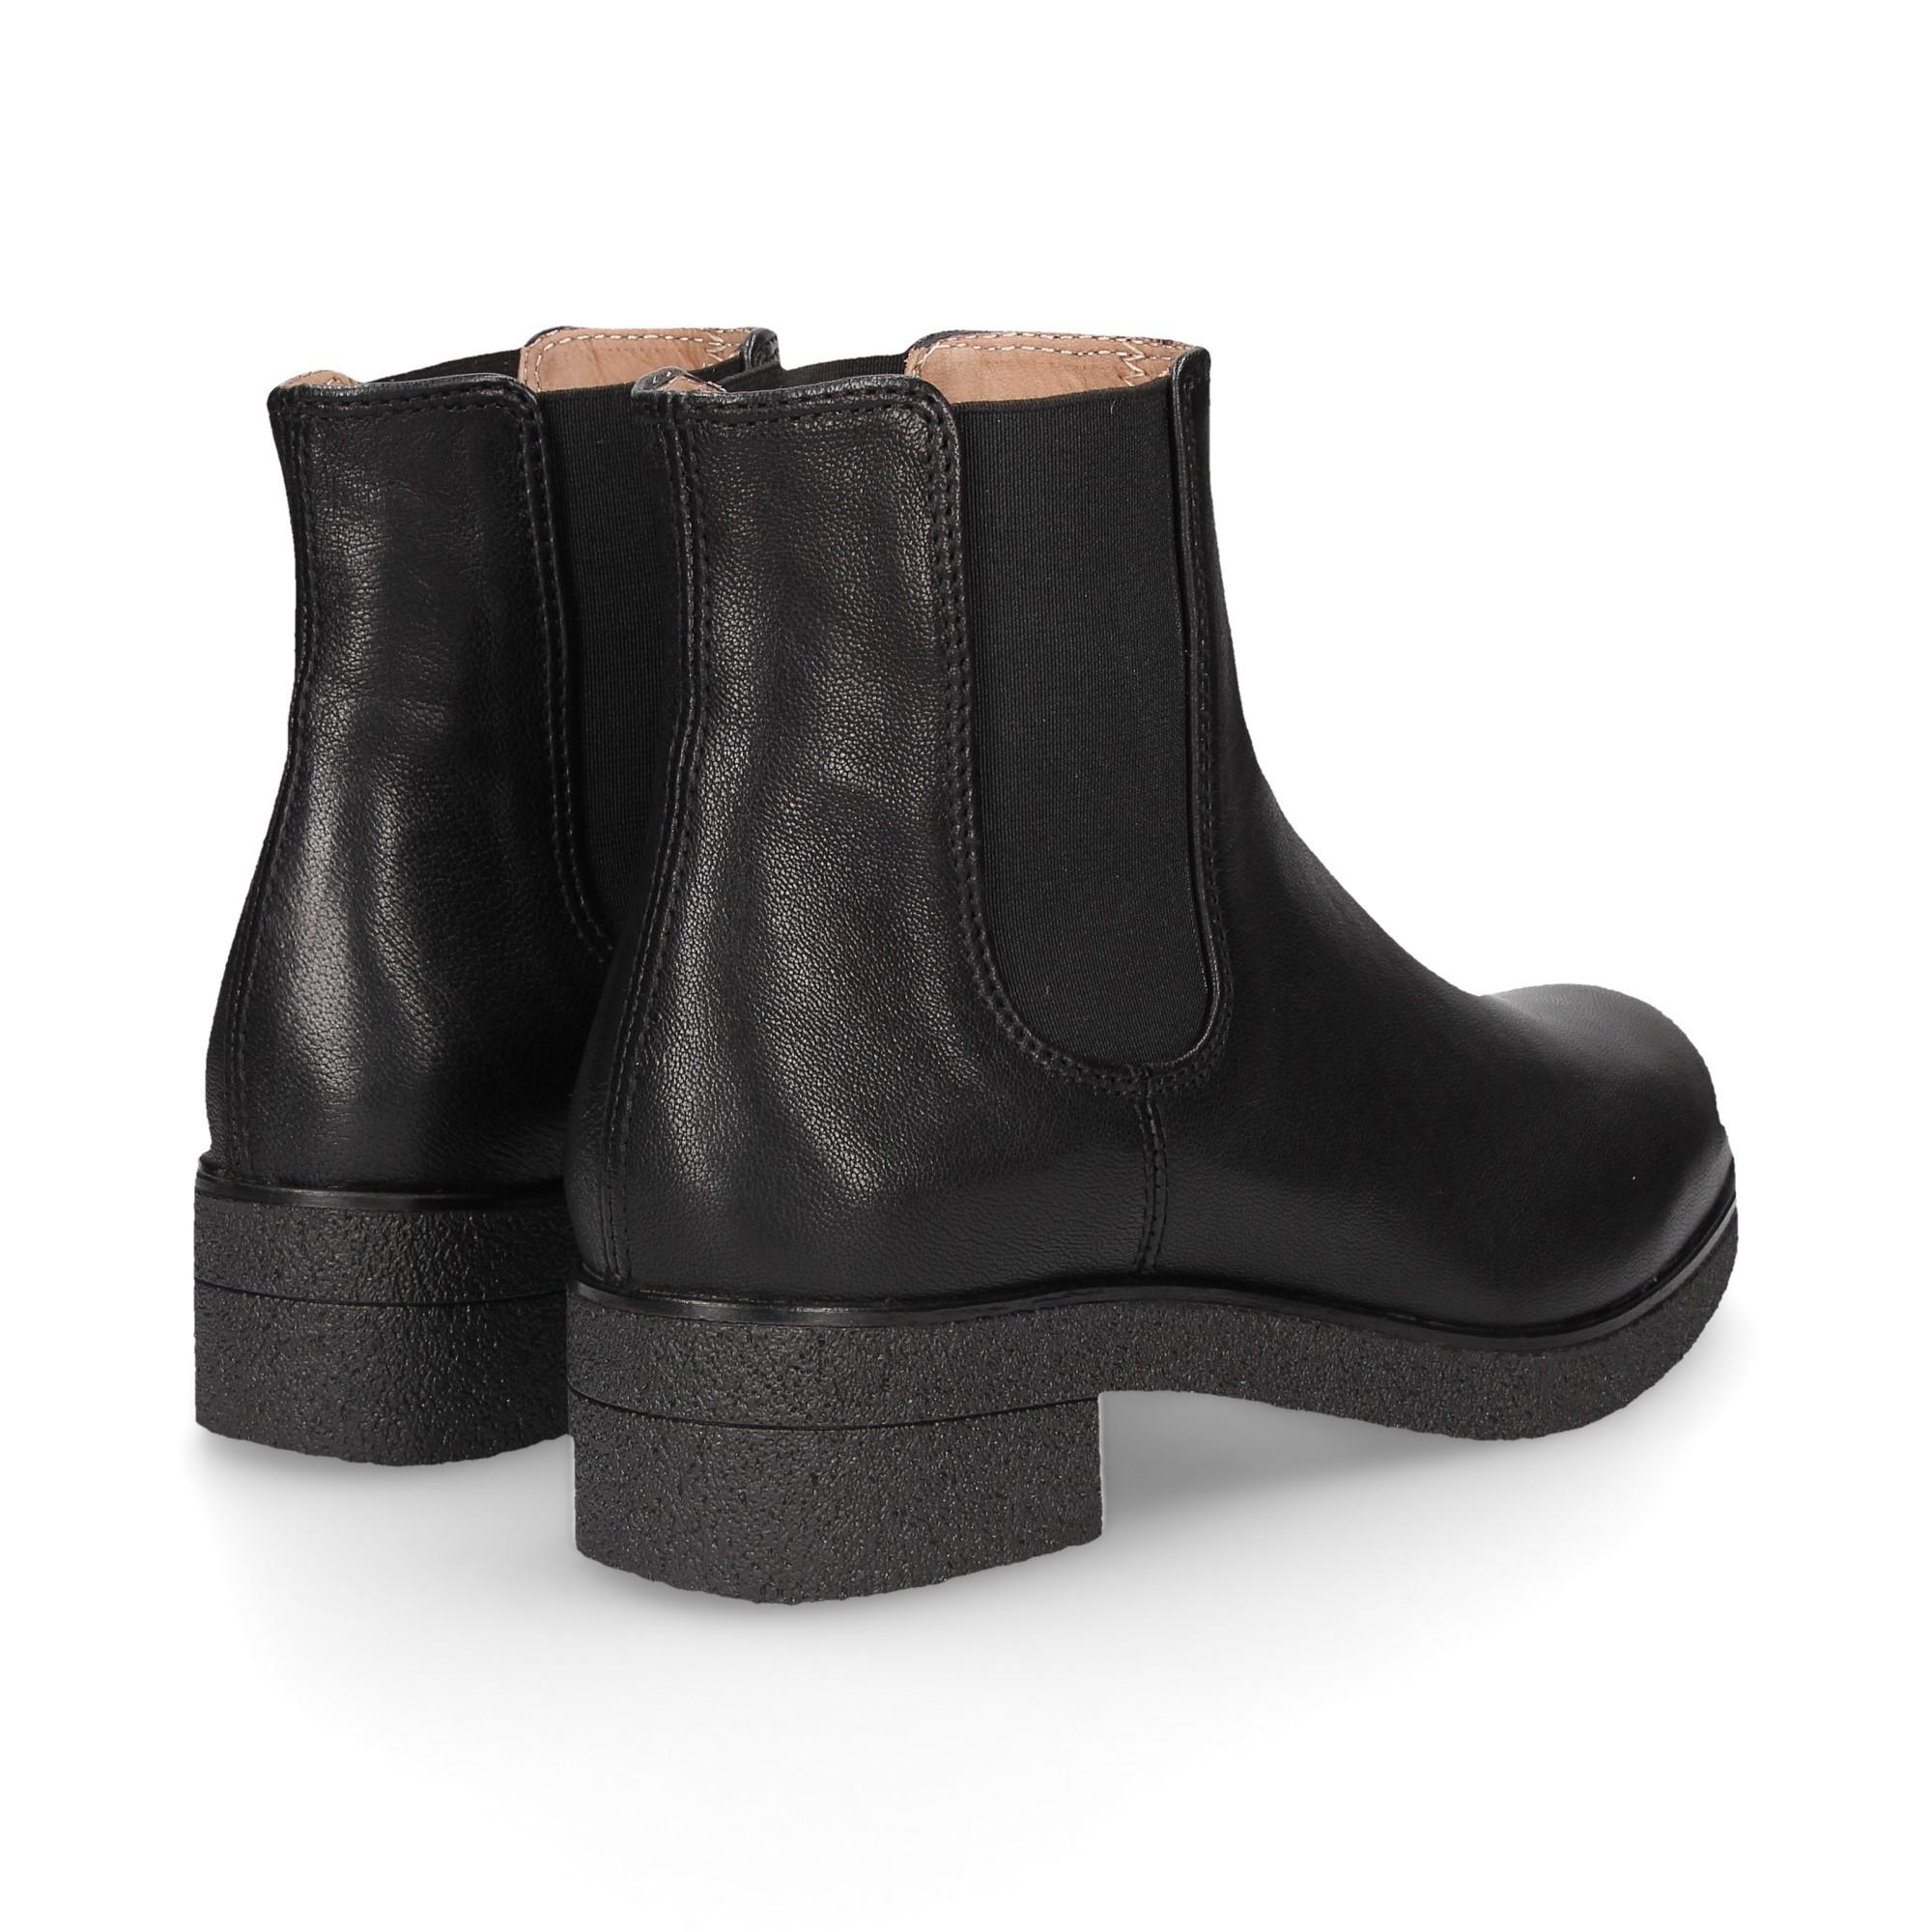 botin-crepe-elatico-lados-napa-black